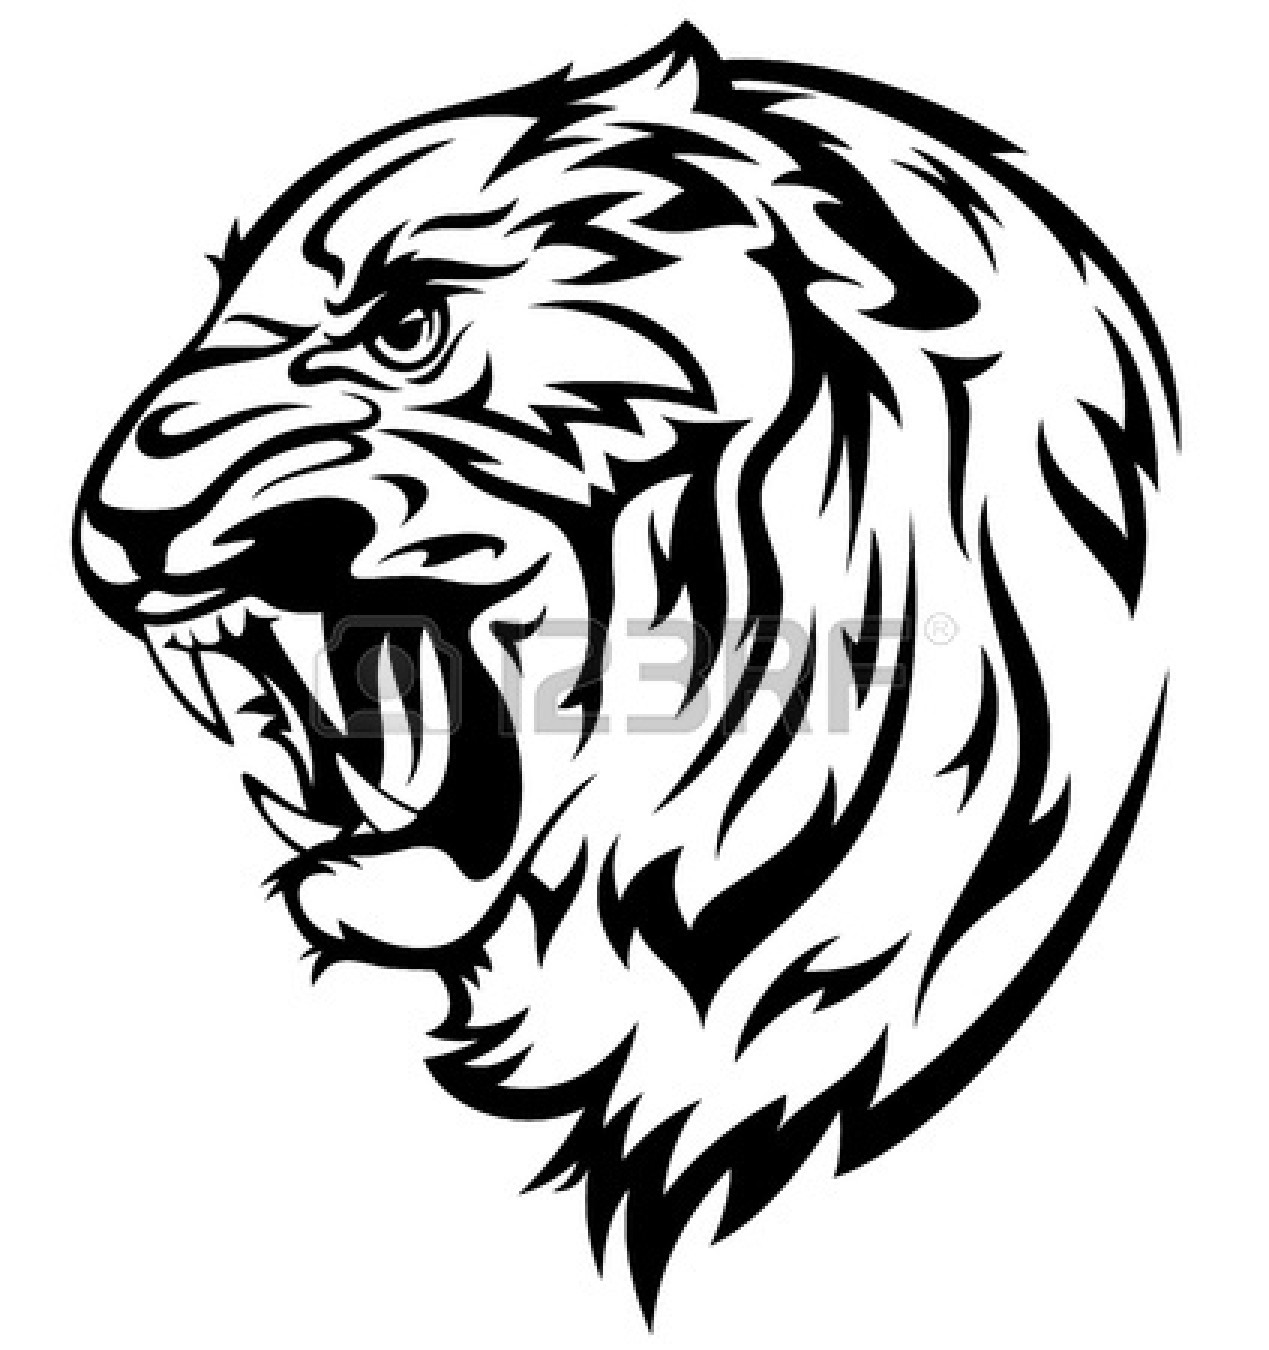 tiger face clip art black clipart panda free clipart images rh clipartpanda com angry tiger face clipart tiger face clipart easy